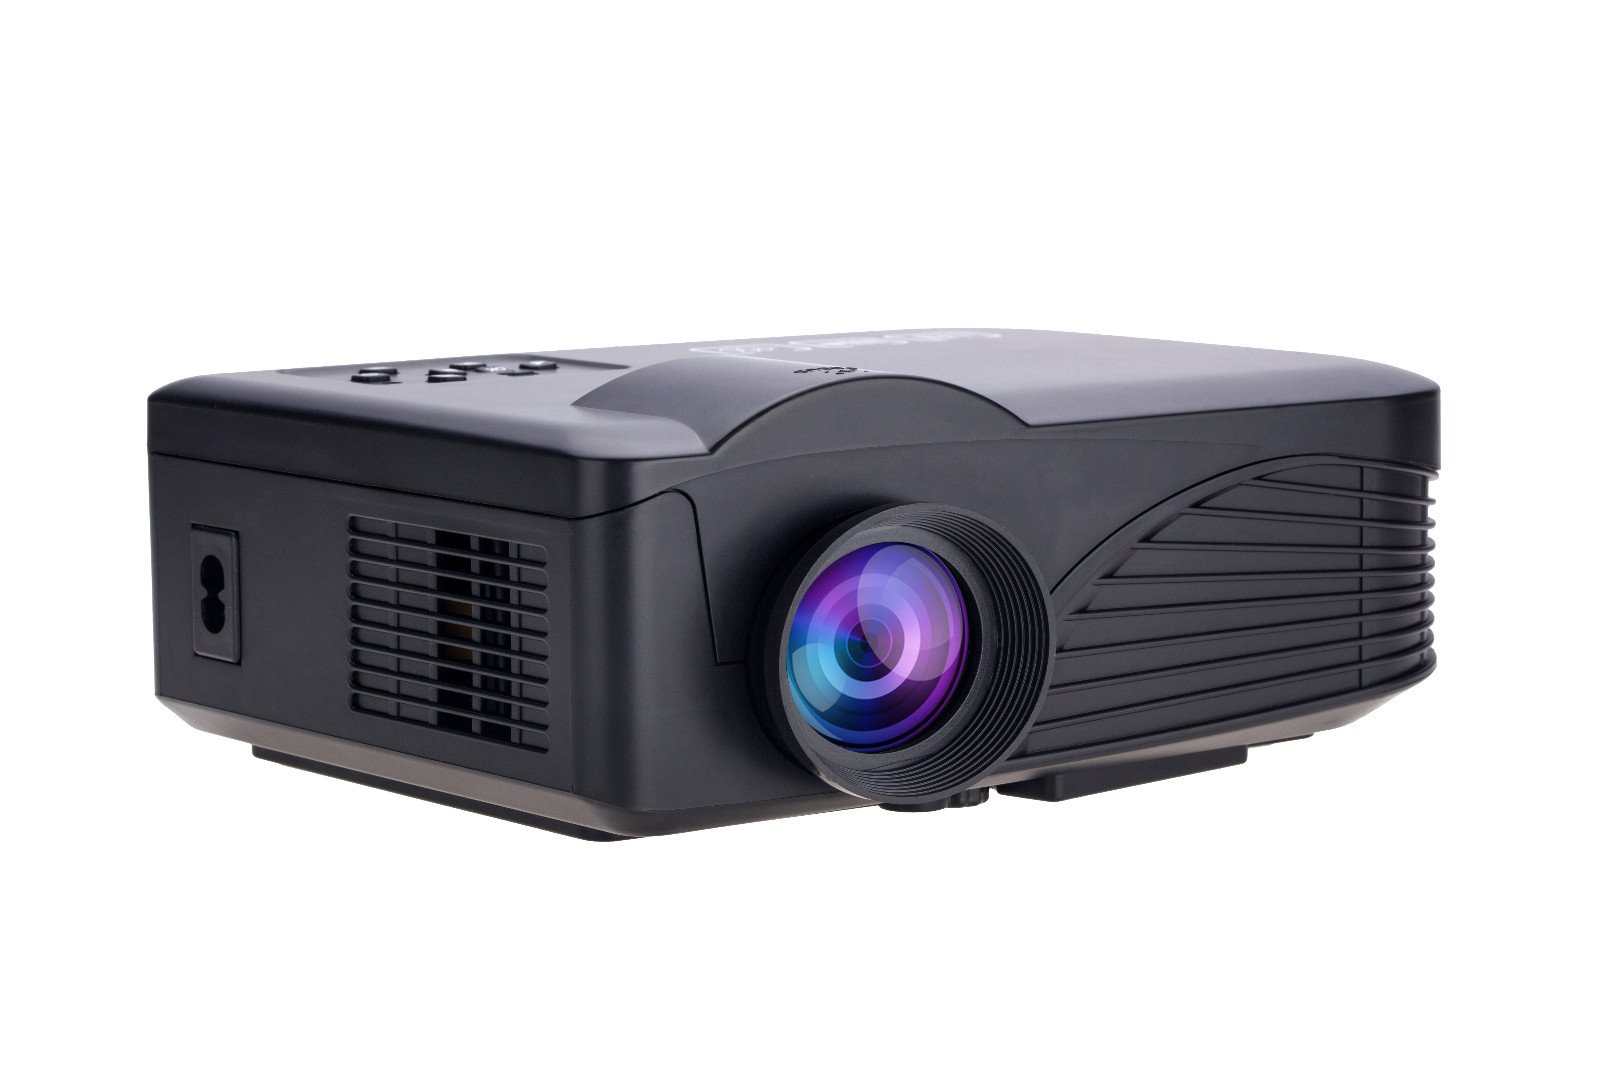 Home Cinema Projectors, VerRich Home Cinema Theater HD 3D Projector Multimedia LED Projector HD 1080P PC AV TV VGA USB HDMI 3D 1000 Lumens